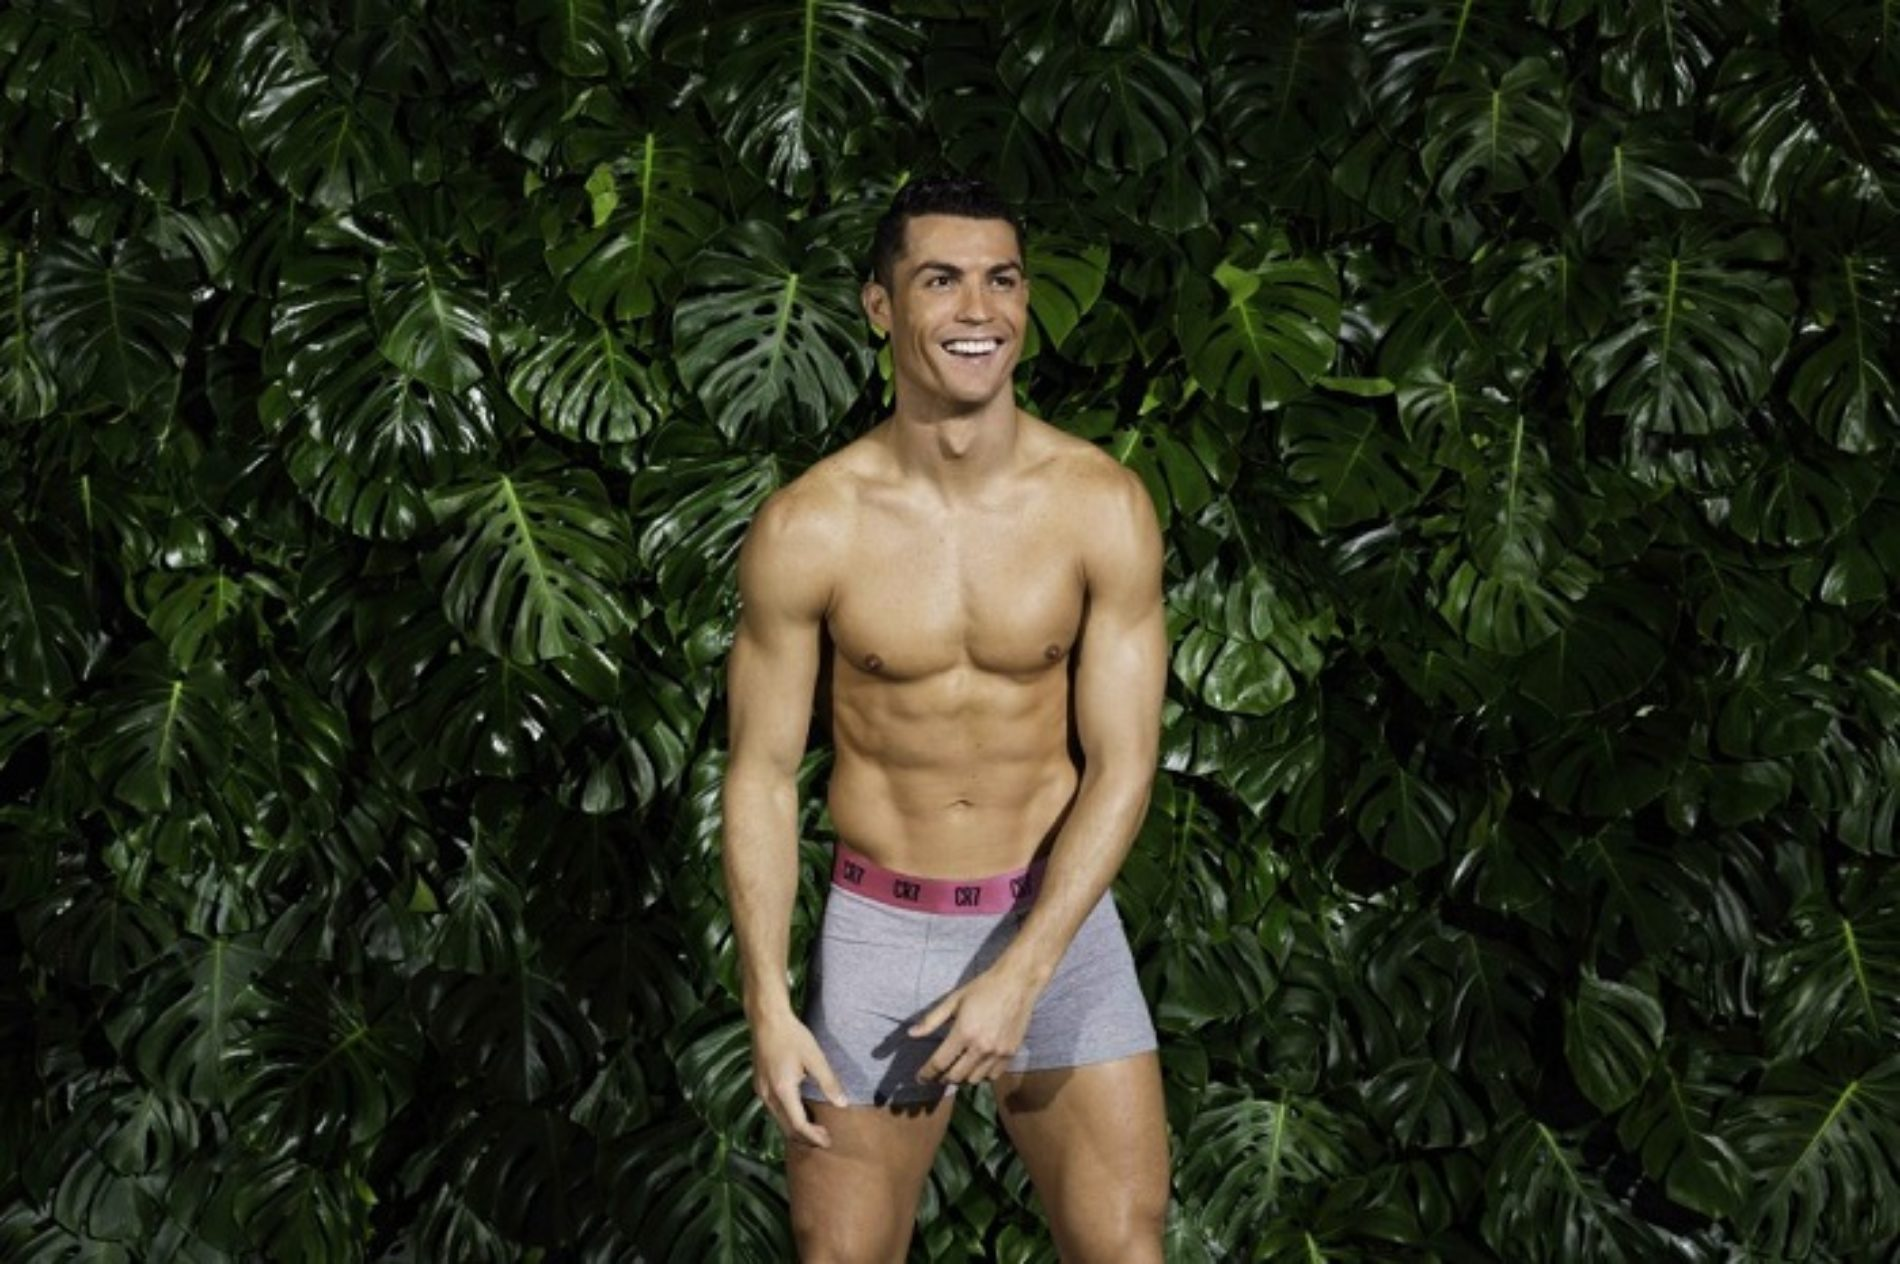 Cristiano Ronaldo in those underwear photos though… sigh